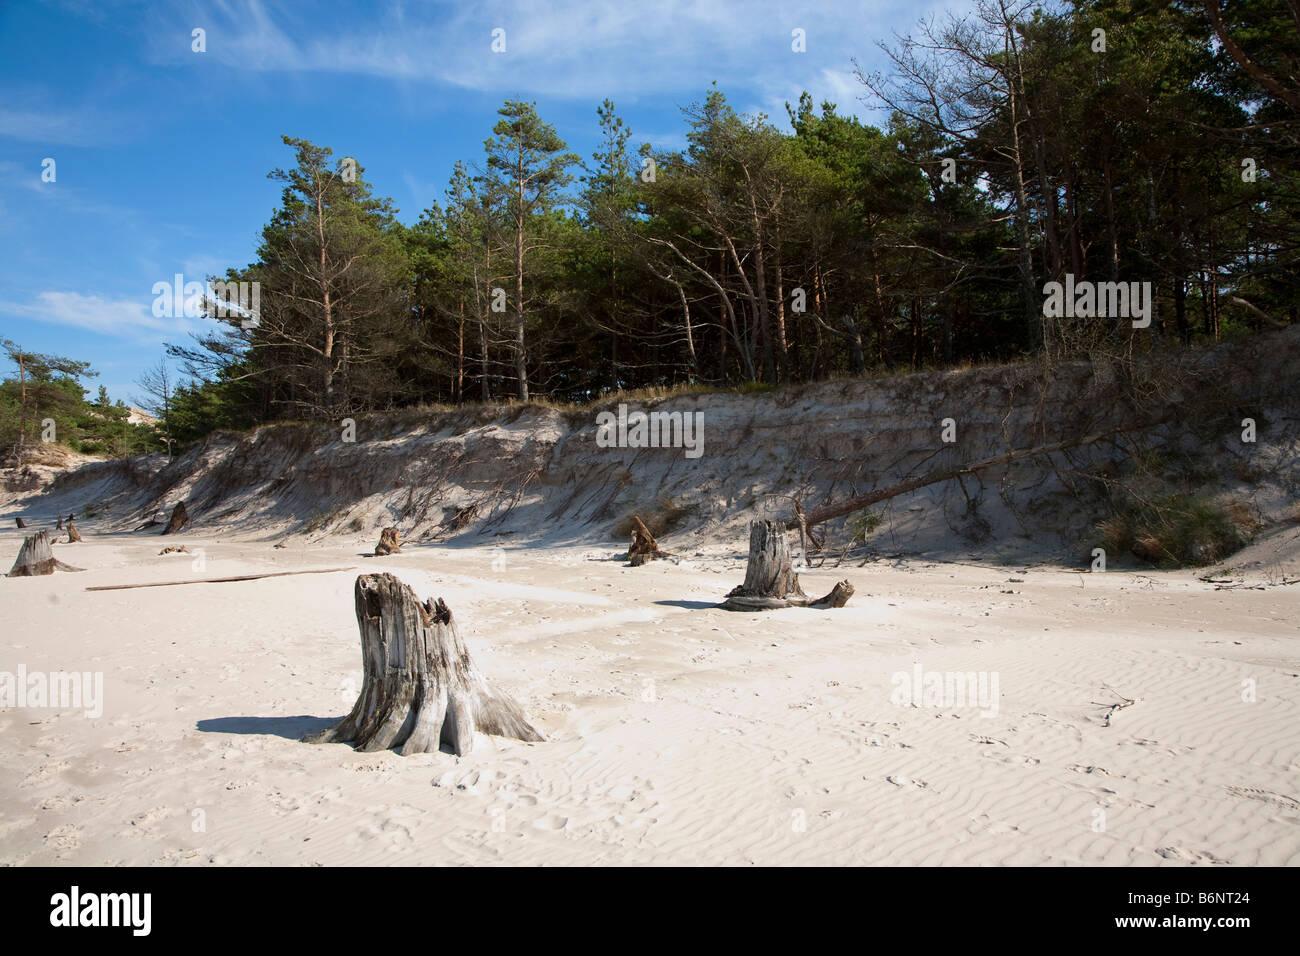 Dead tree stumps in beach uncovered by dune erosion Slowinski national park Leba Poland - Stock Image